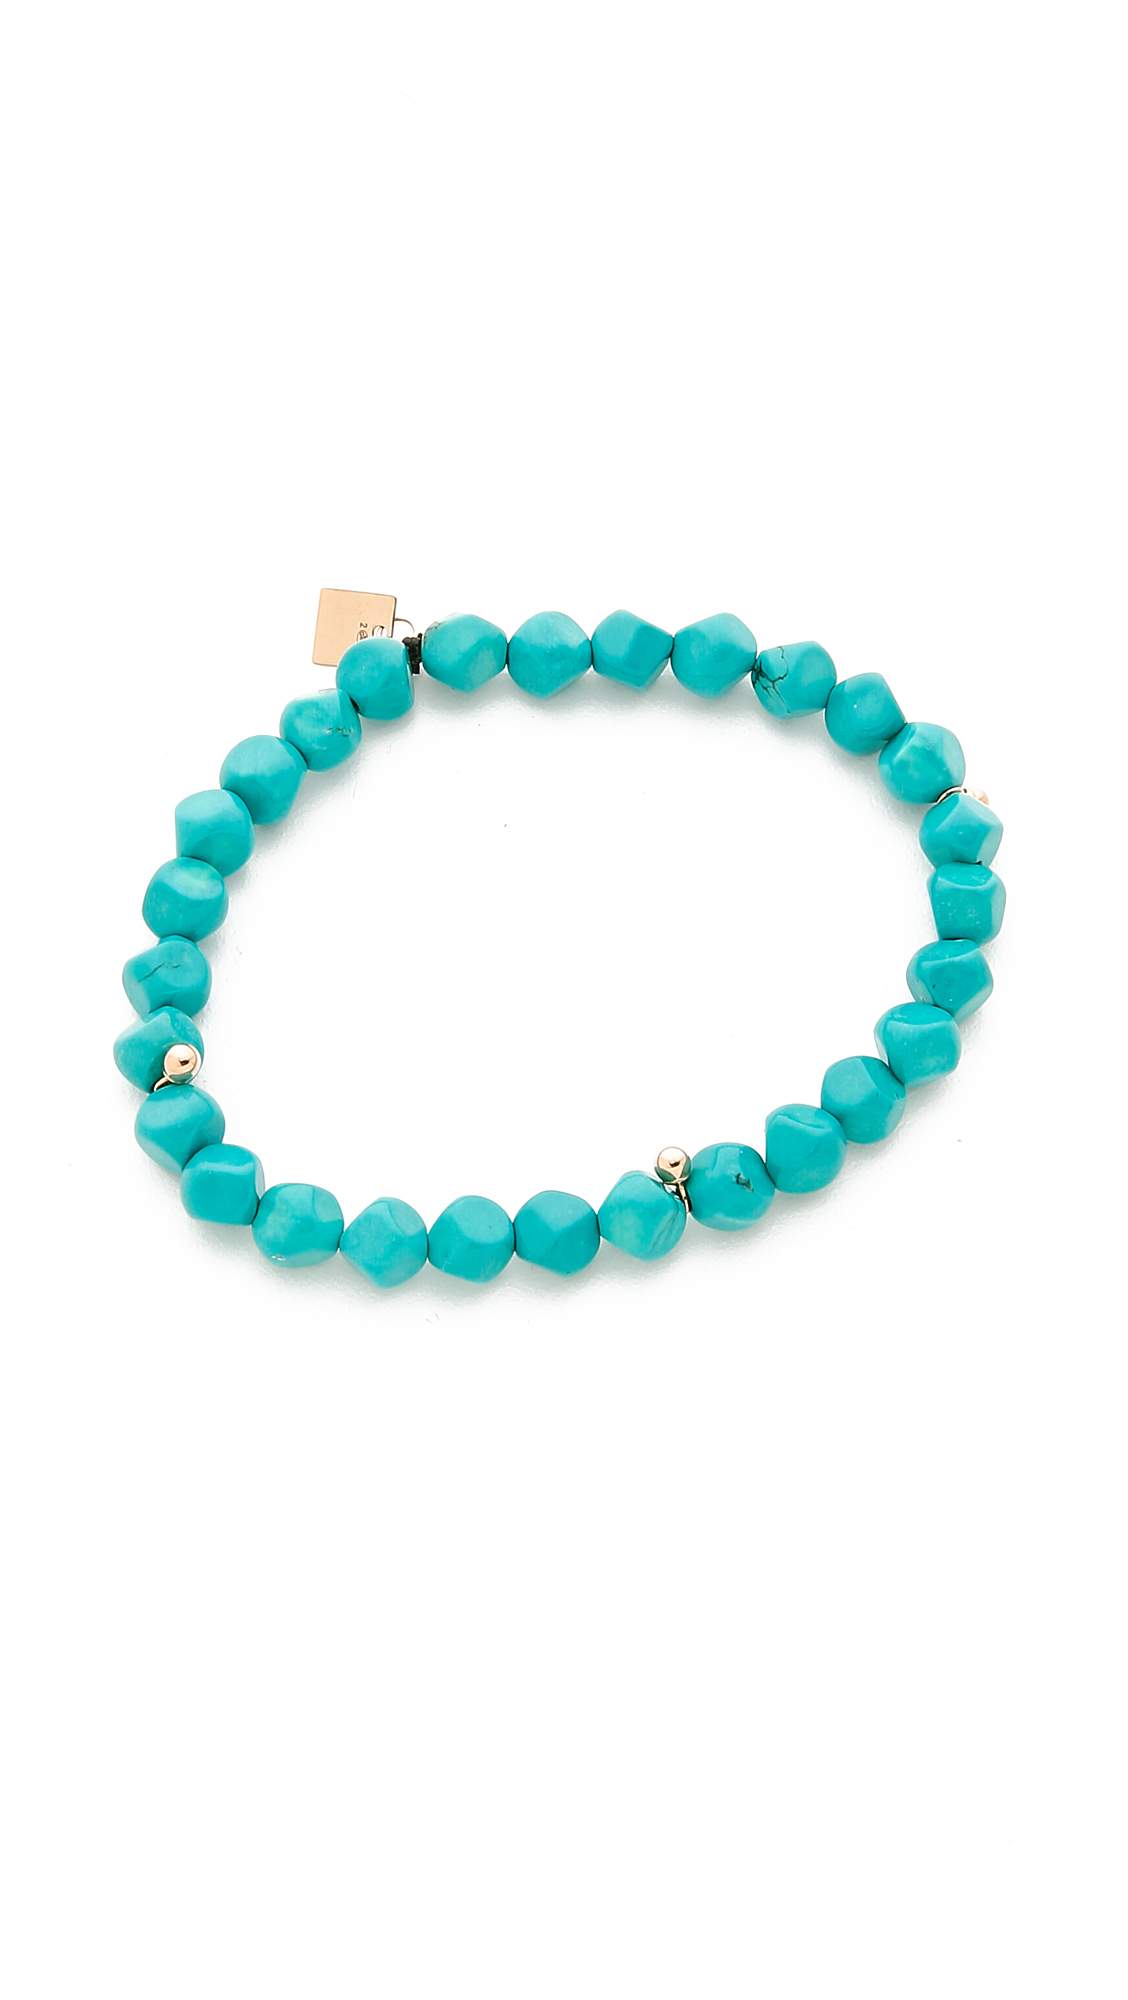 ginette ny fallen sky bracelet in teal turquoise lyst